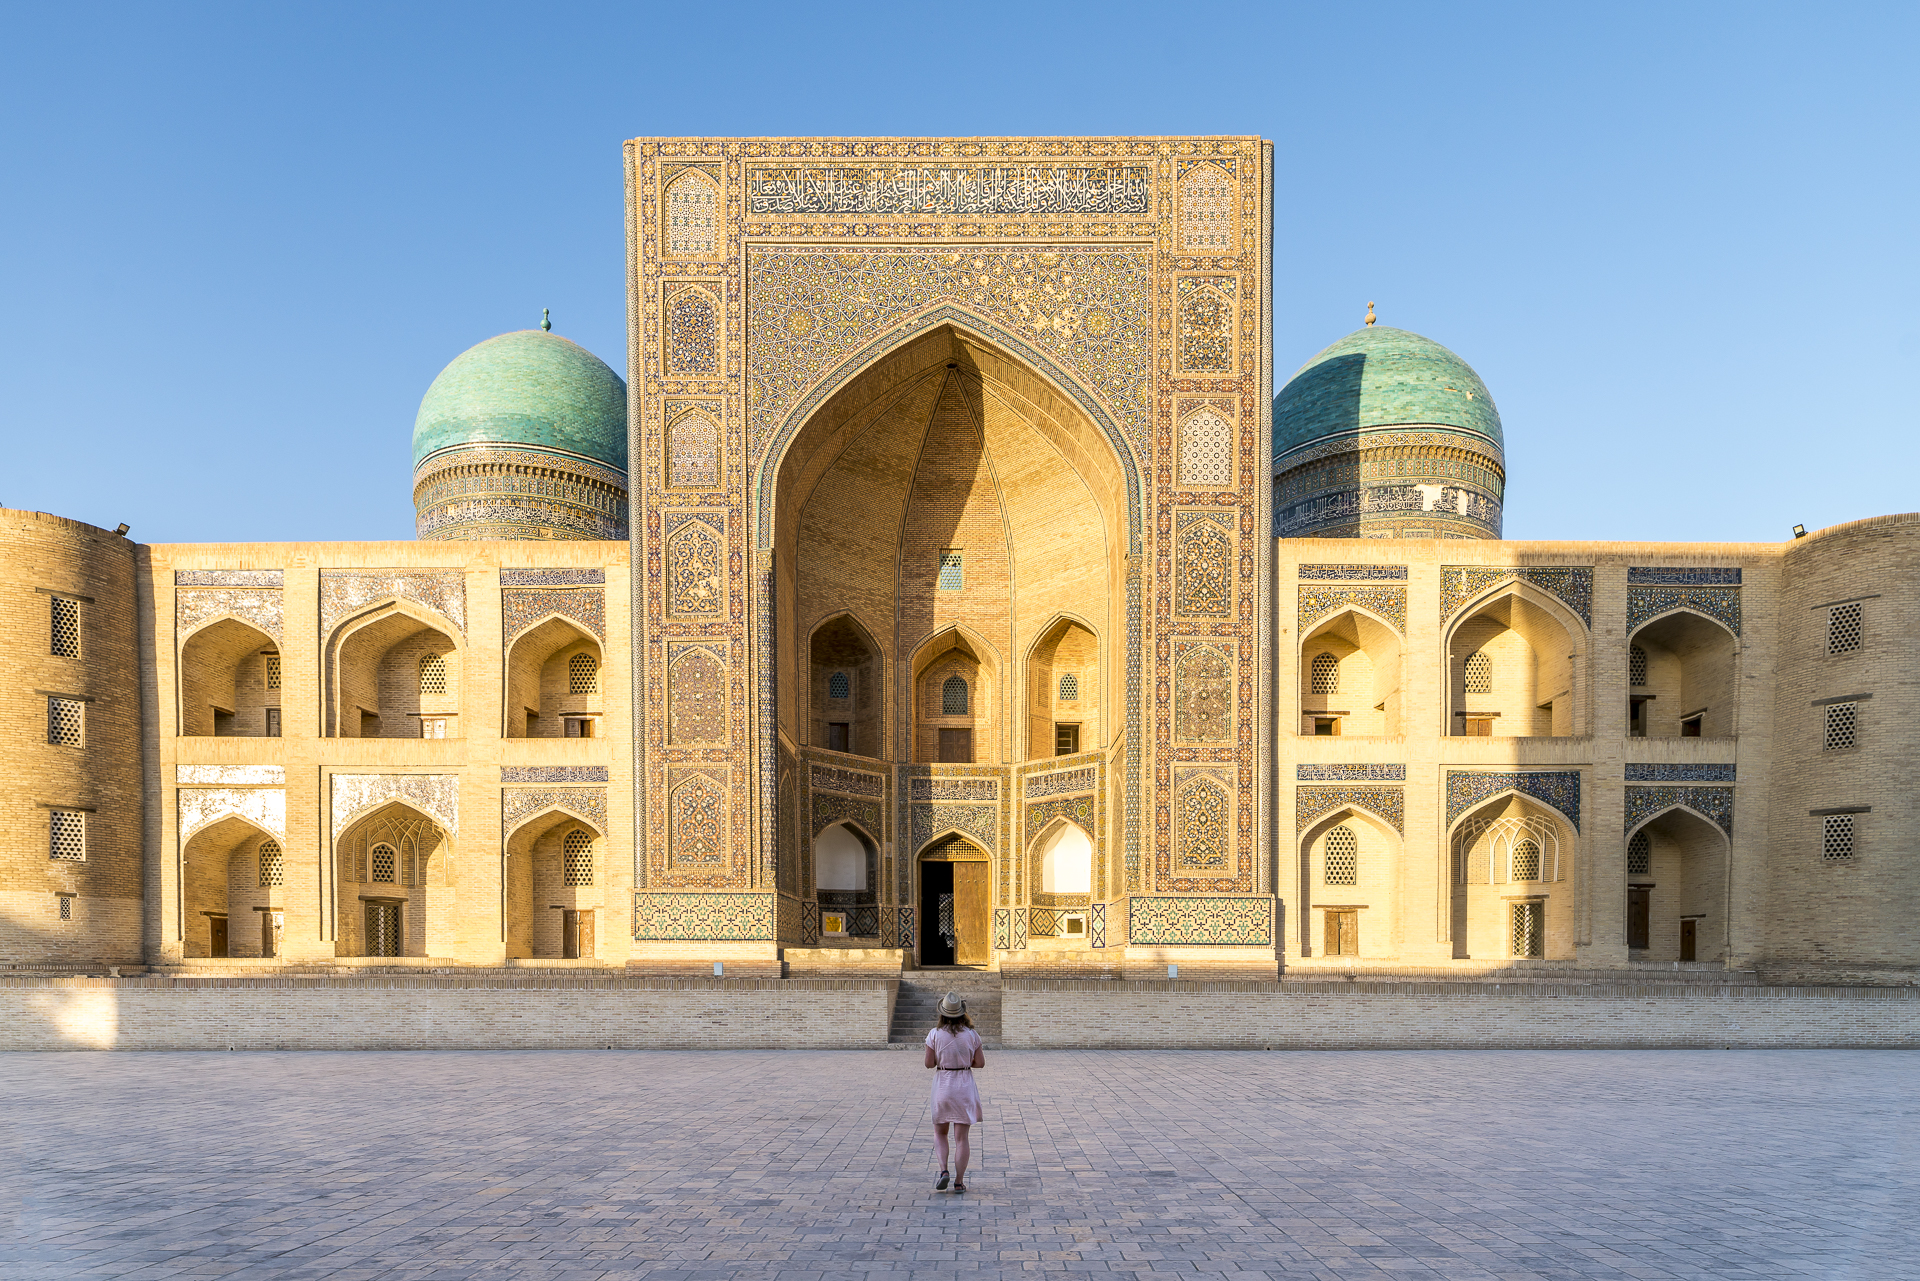 Mir i Arab Moschee